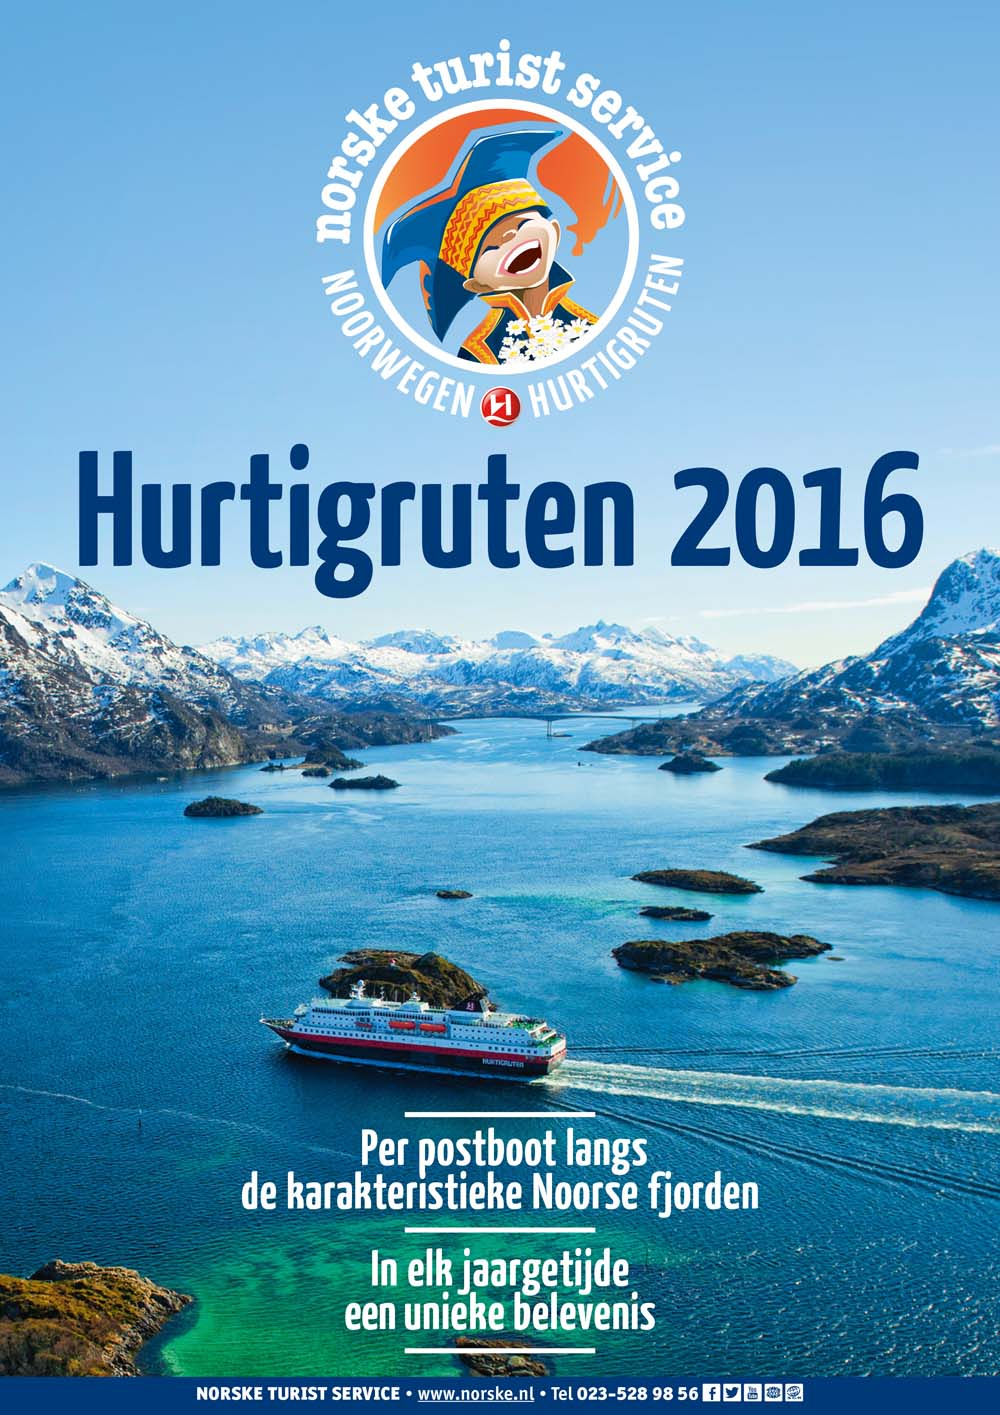 Hurtigruten 2016